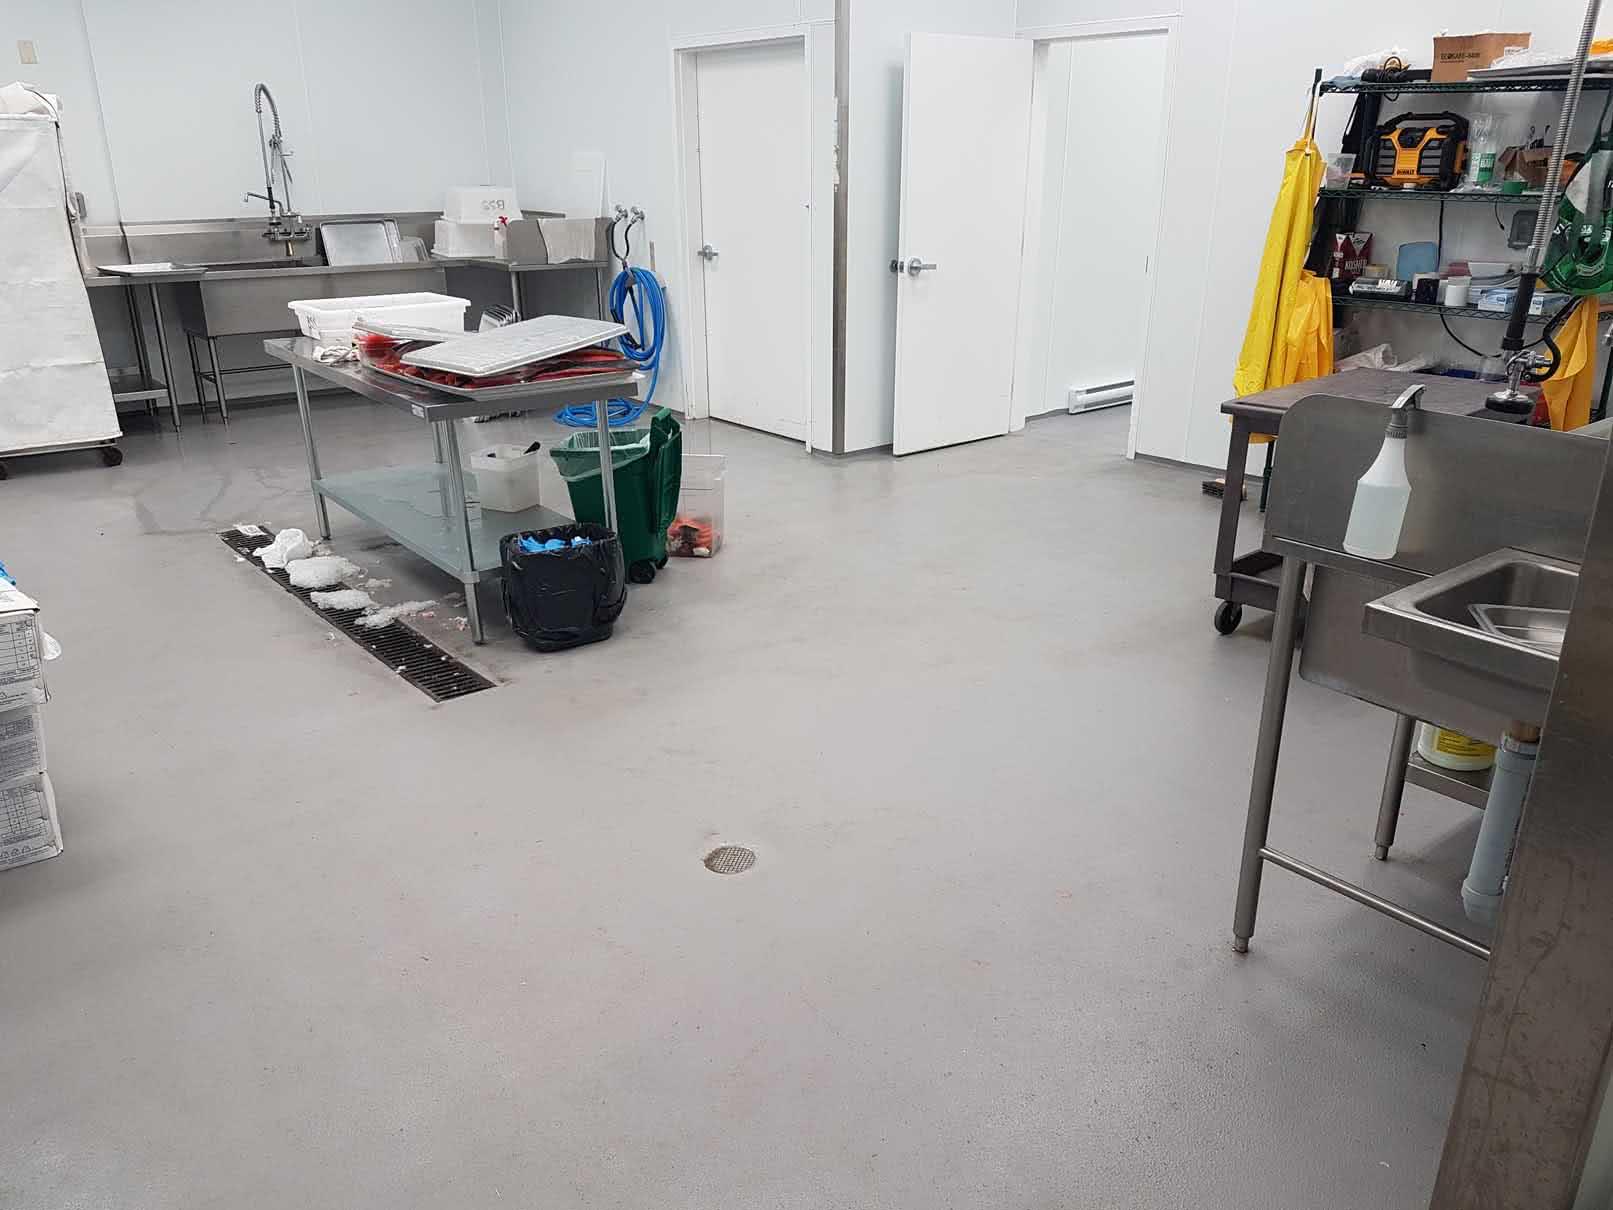 Concrete floor resurfacing at Cowichan Bay Seafood